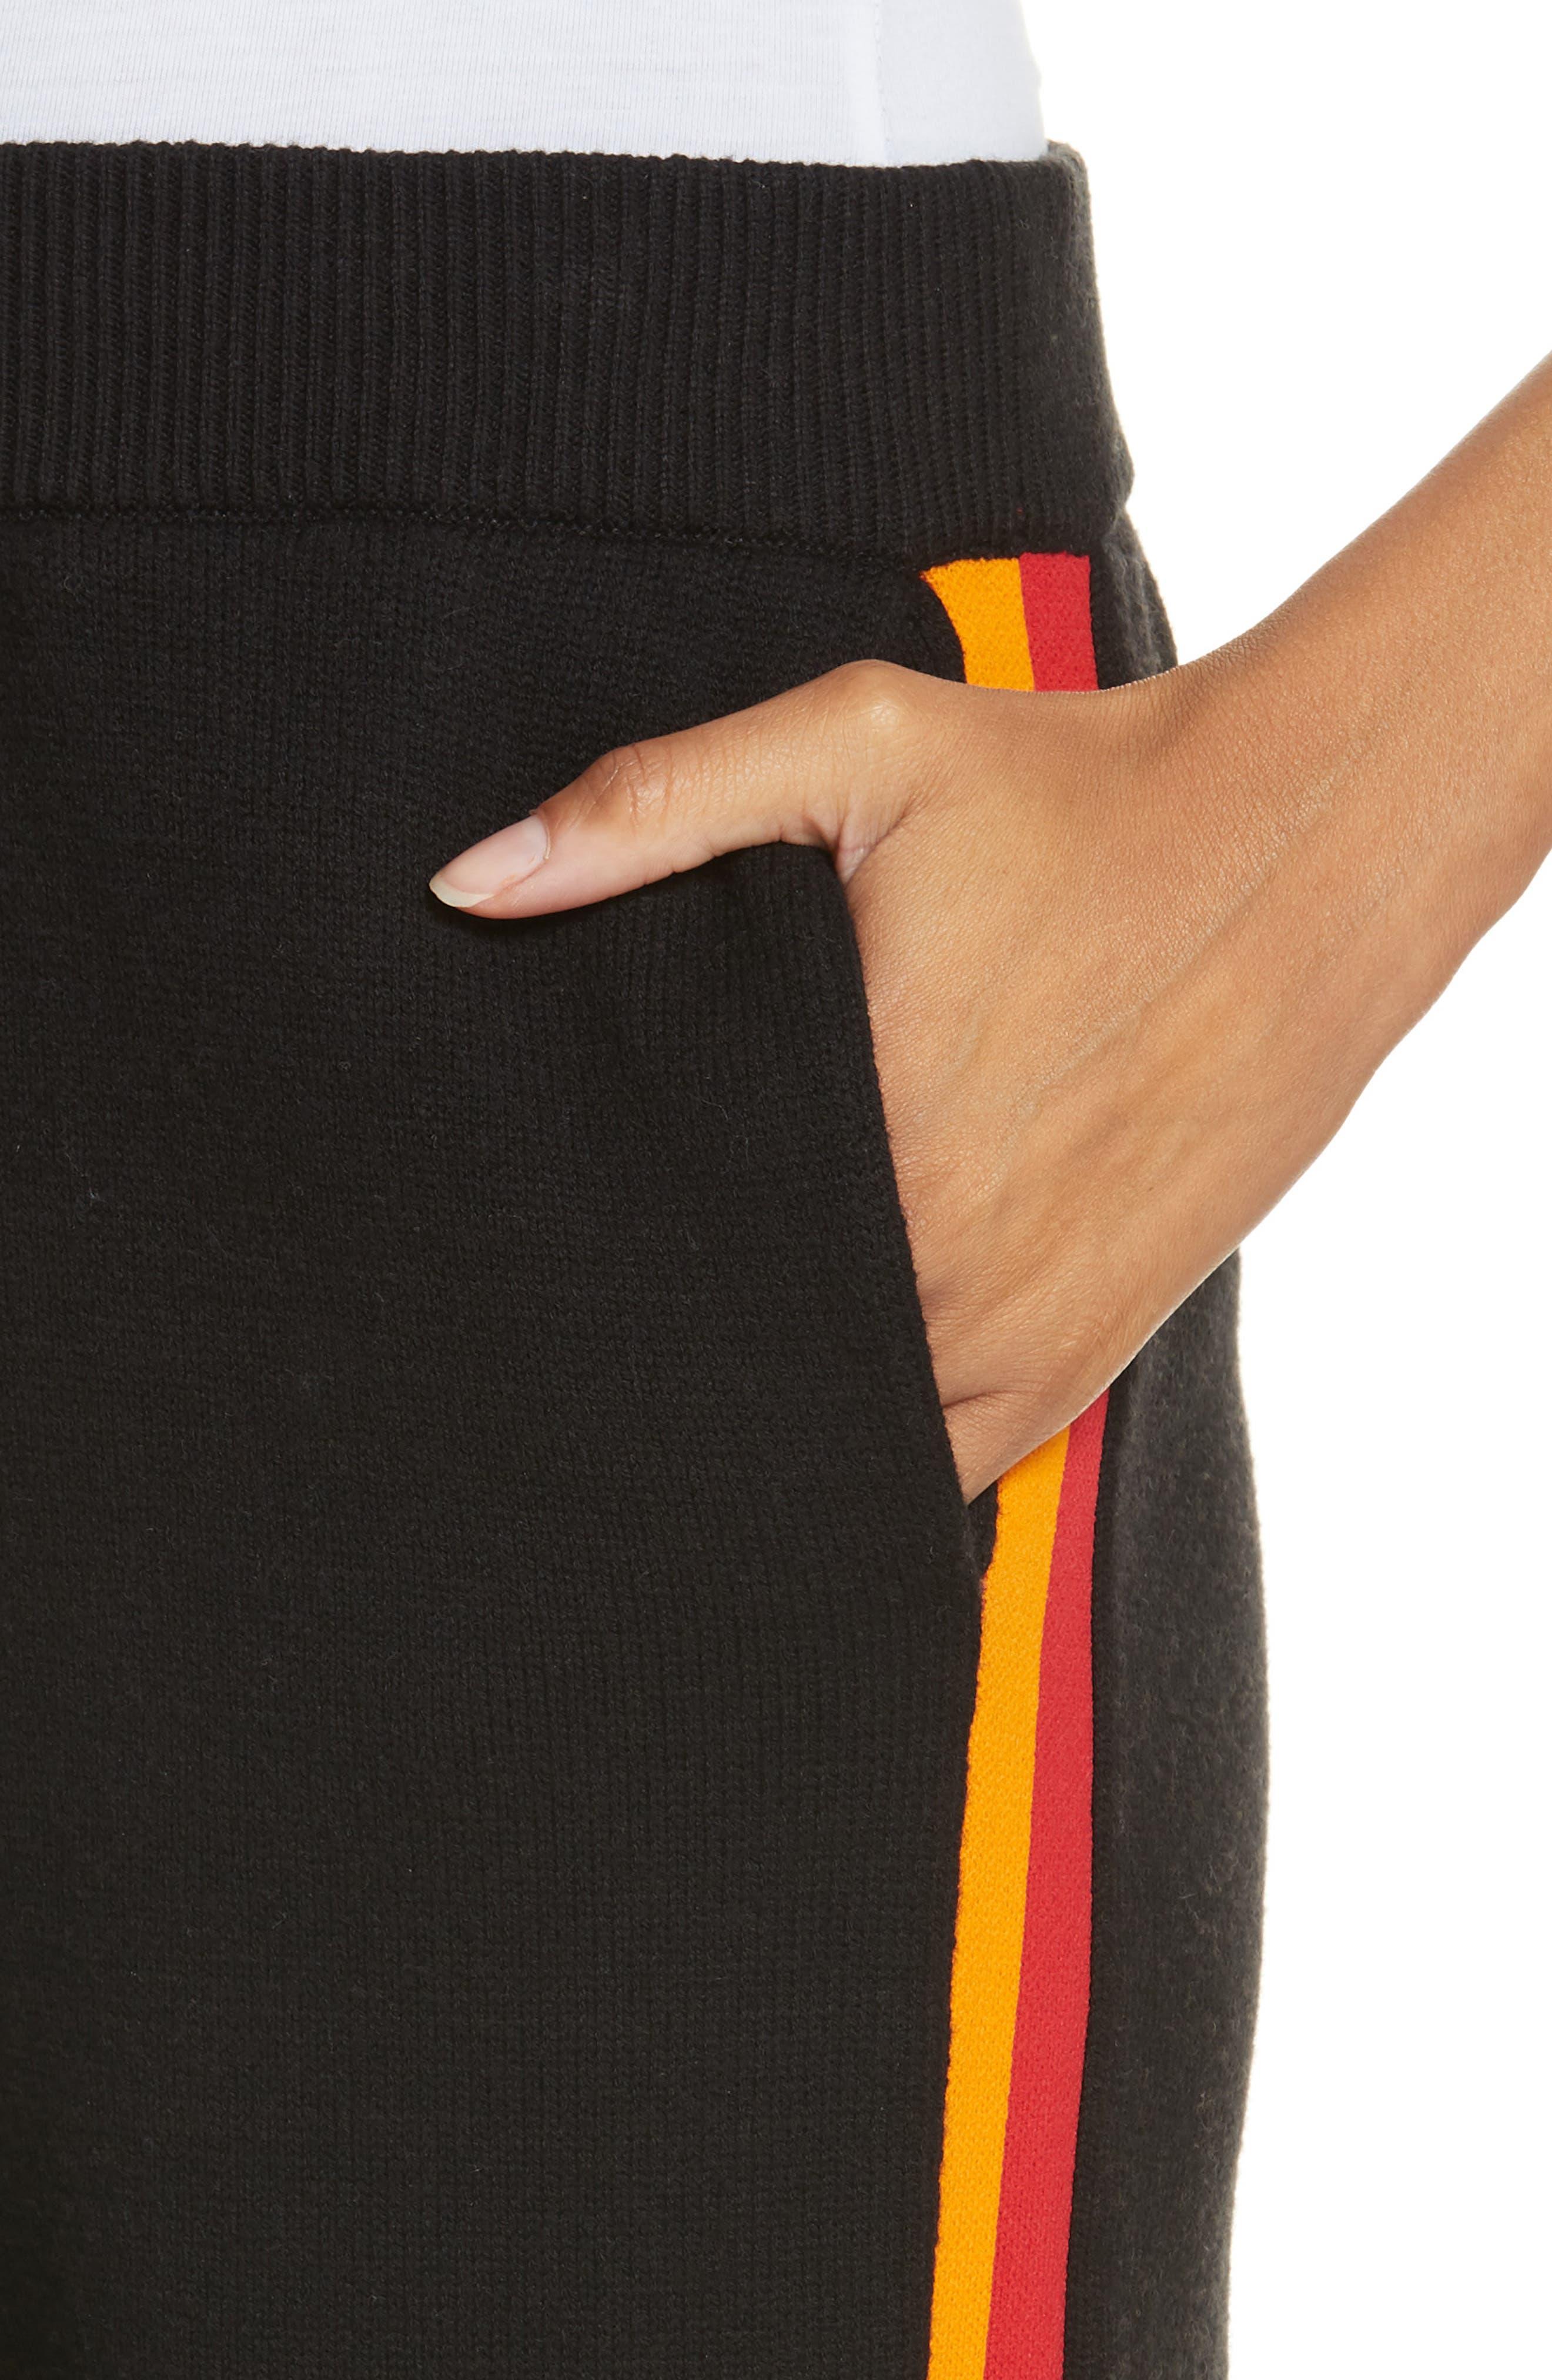 OPENING CEREMONY,                             Unisex Jogger Pants,                             Alternate thumbnail 4, color,                             BLACK MULTI